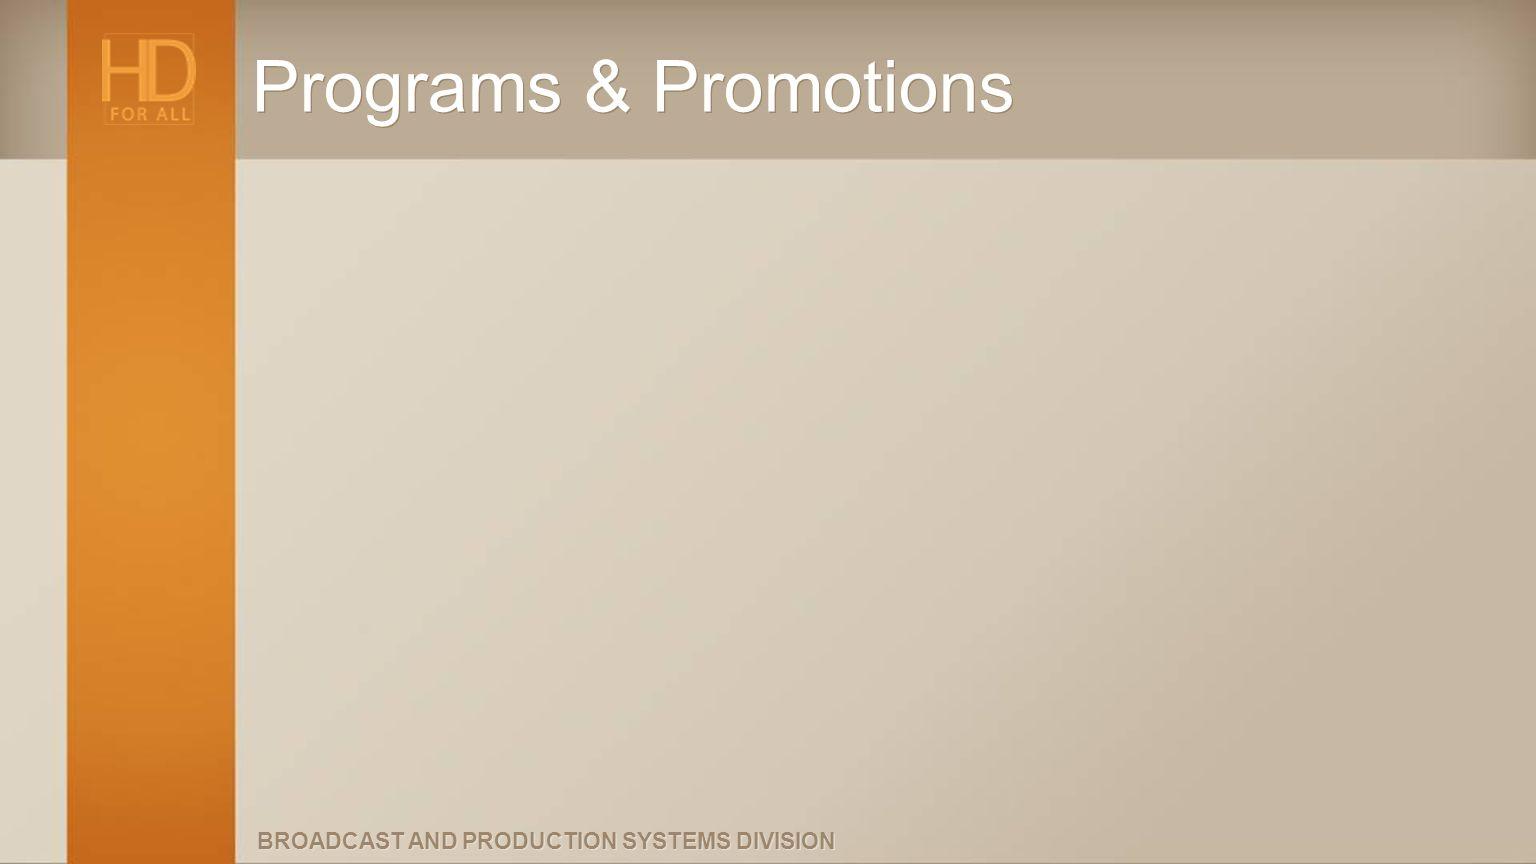 Programs & Promotions